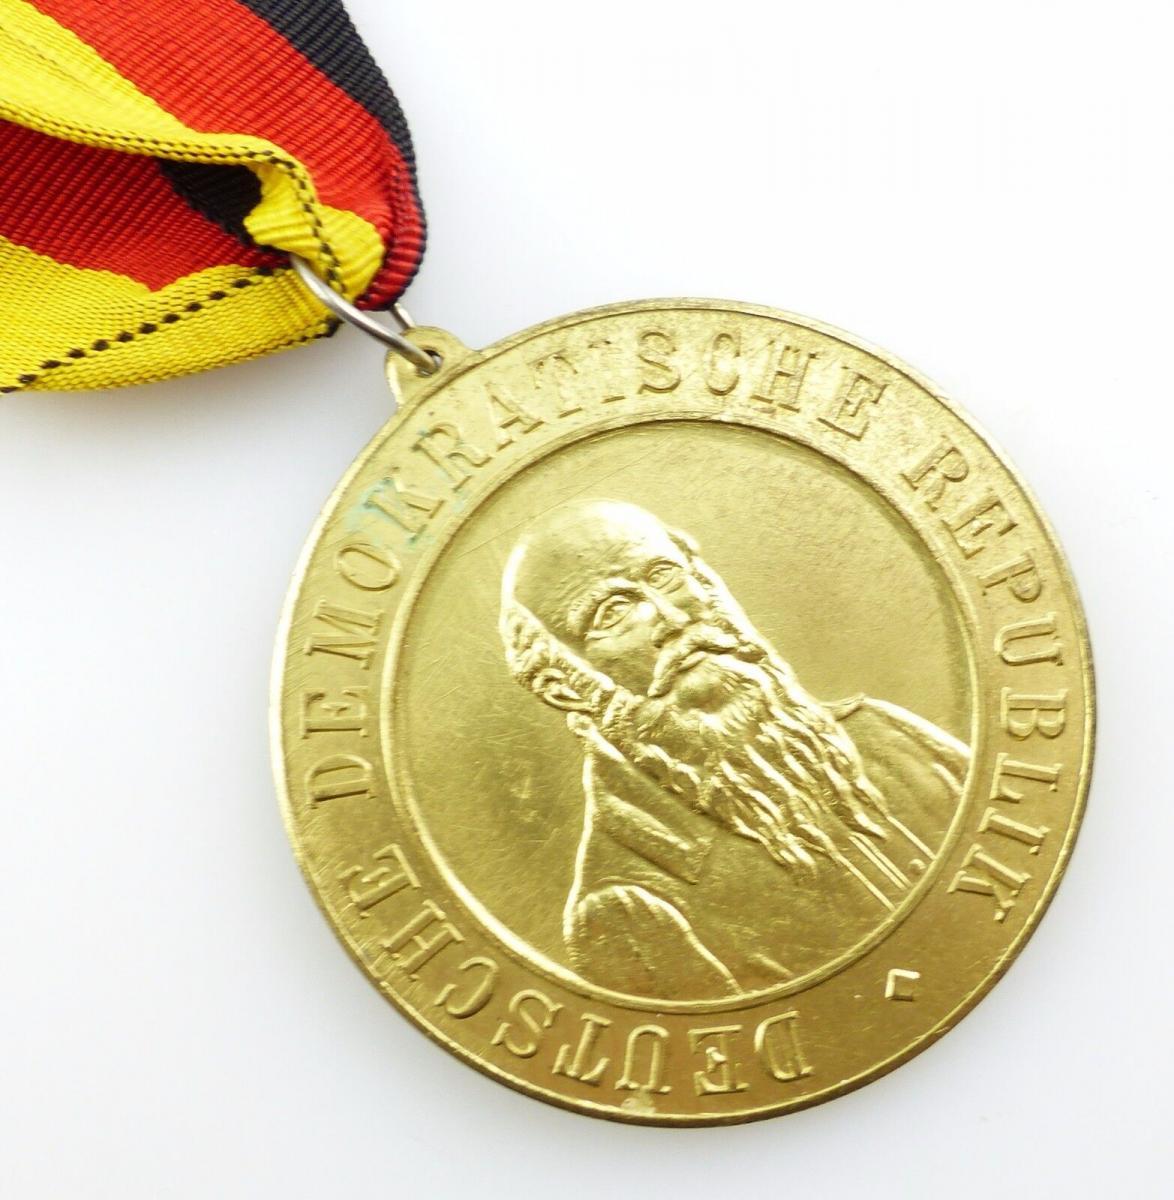 #e5786 DDR Medaille VI. Zentrales Sportfest 1961 Rostock Güstrow goldfarben